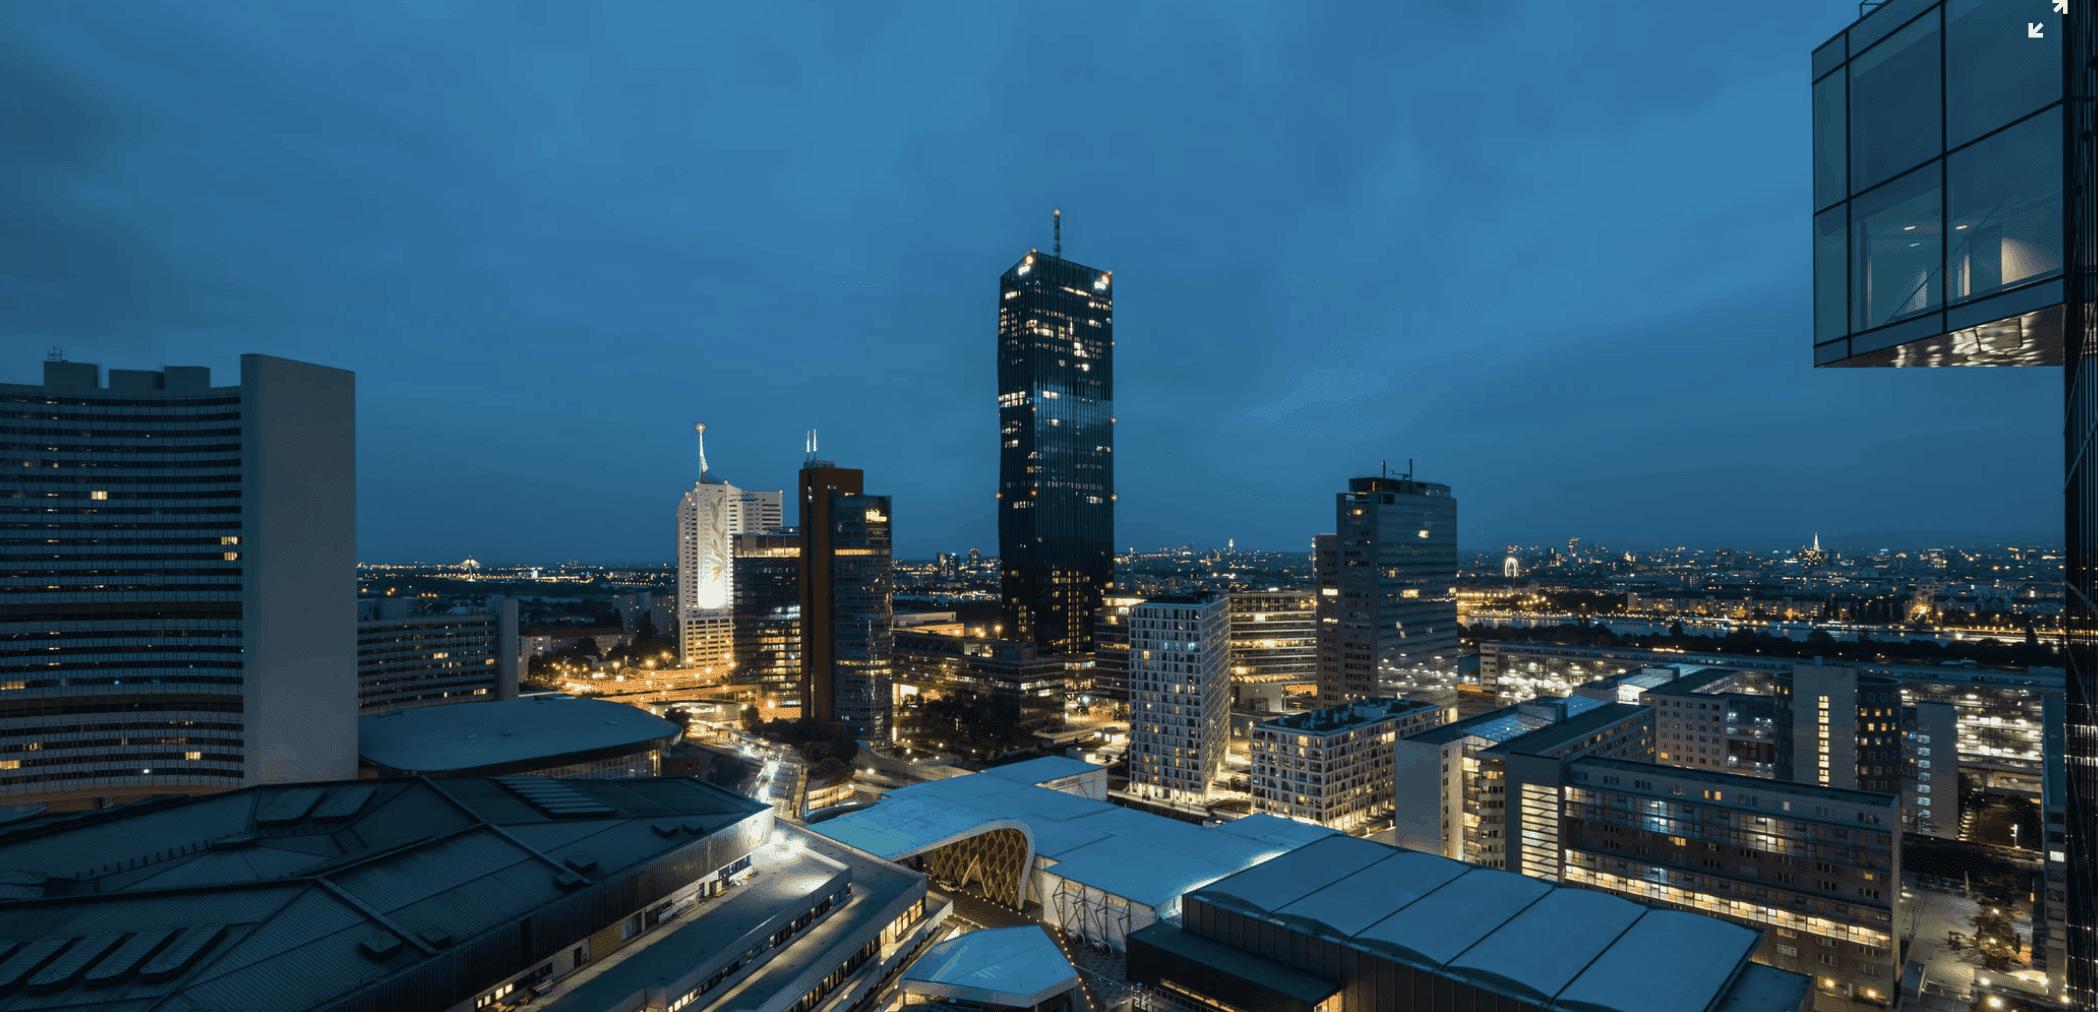 datenbank europäische immobilieninvestoren